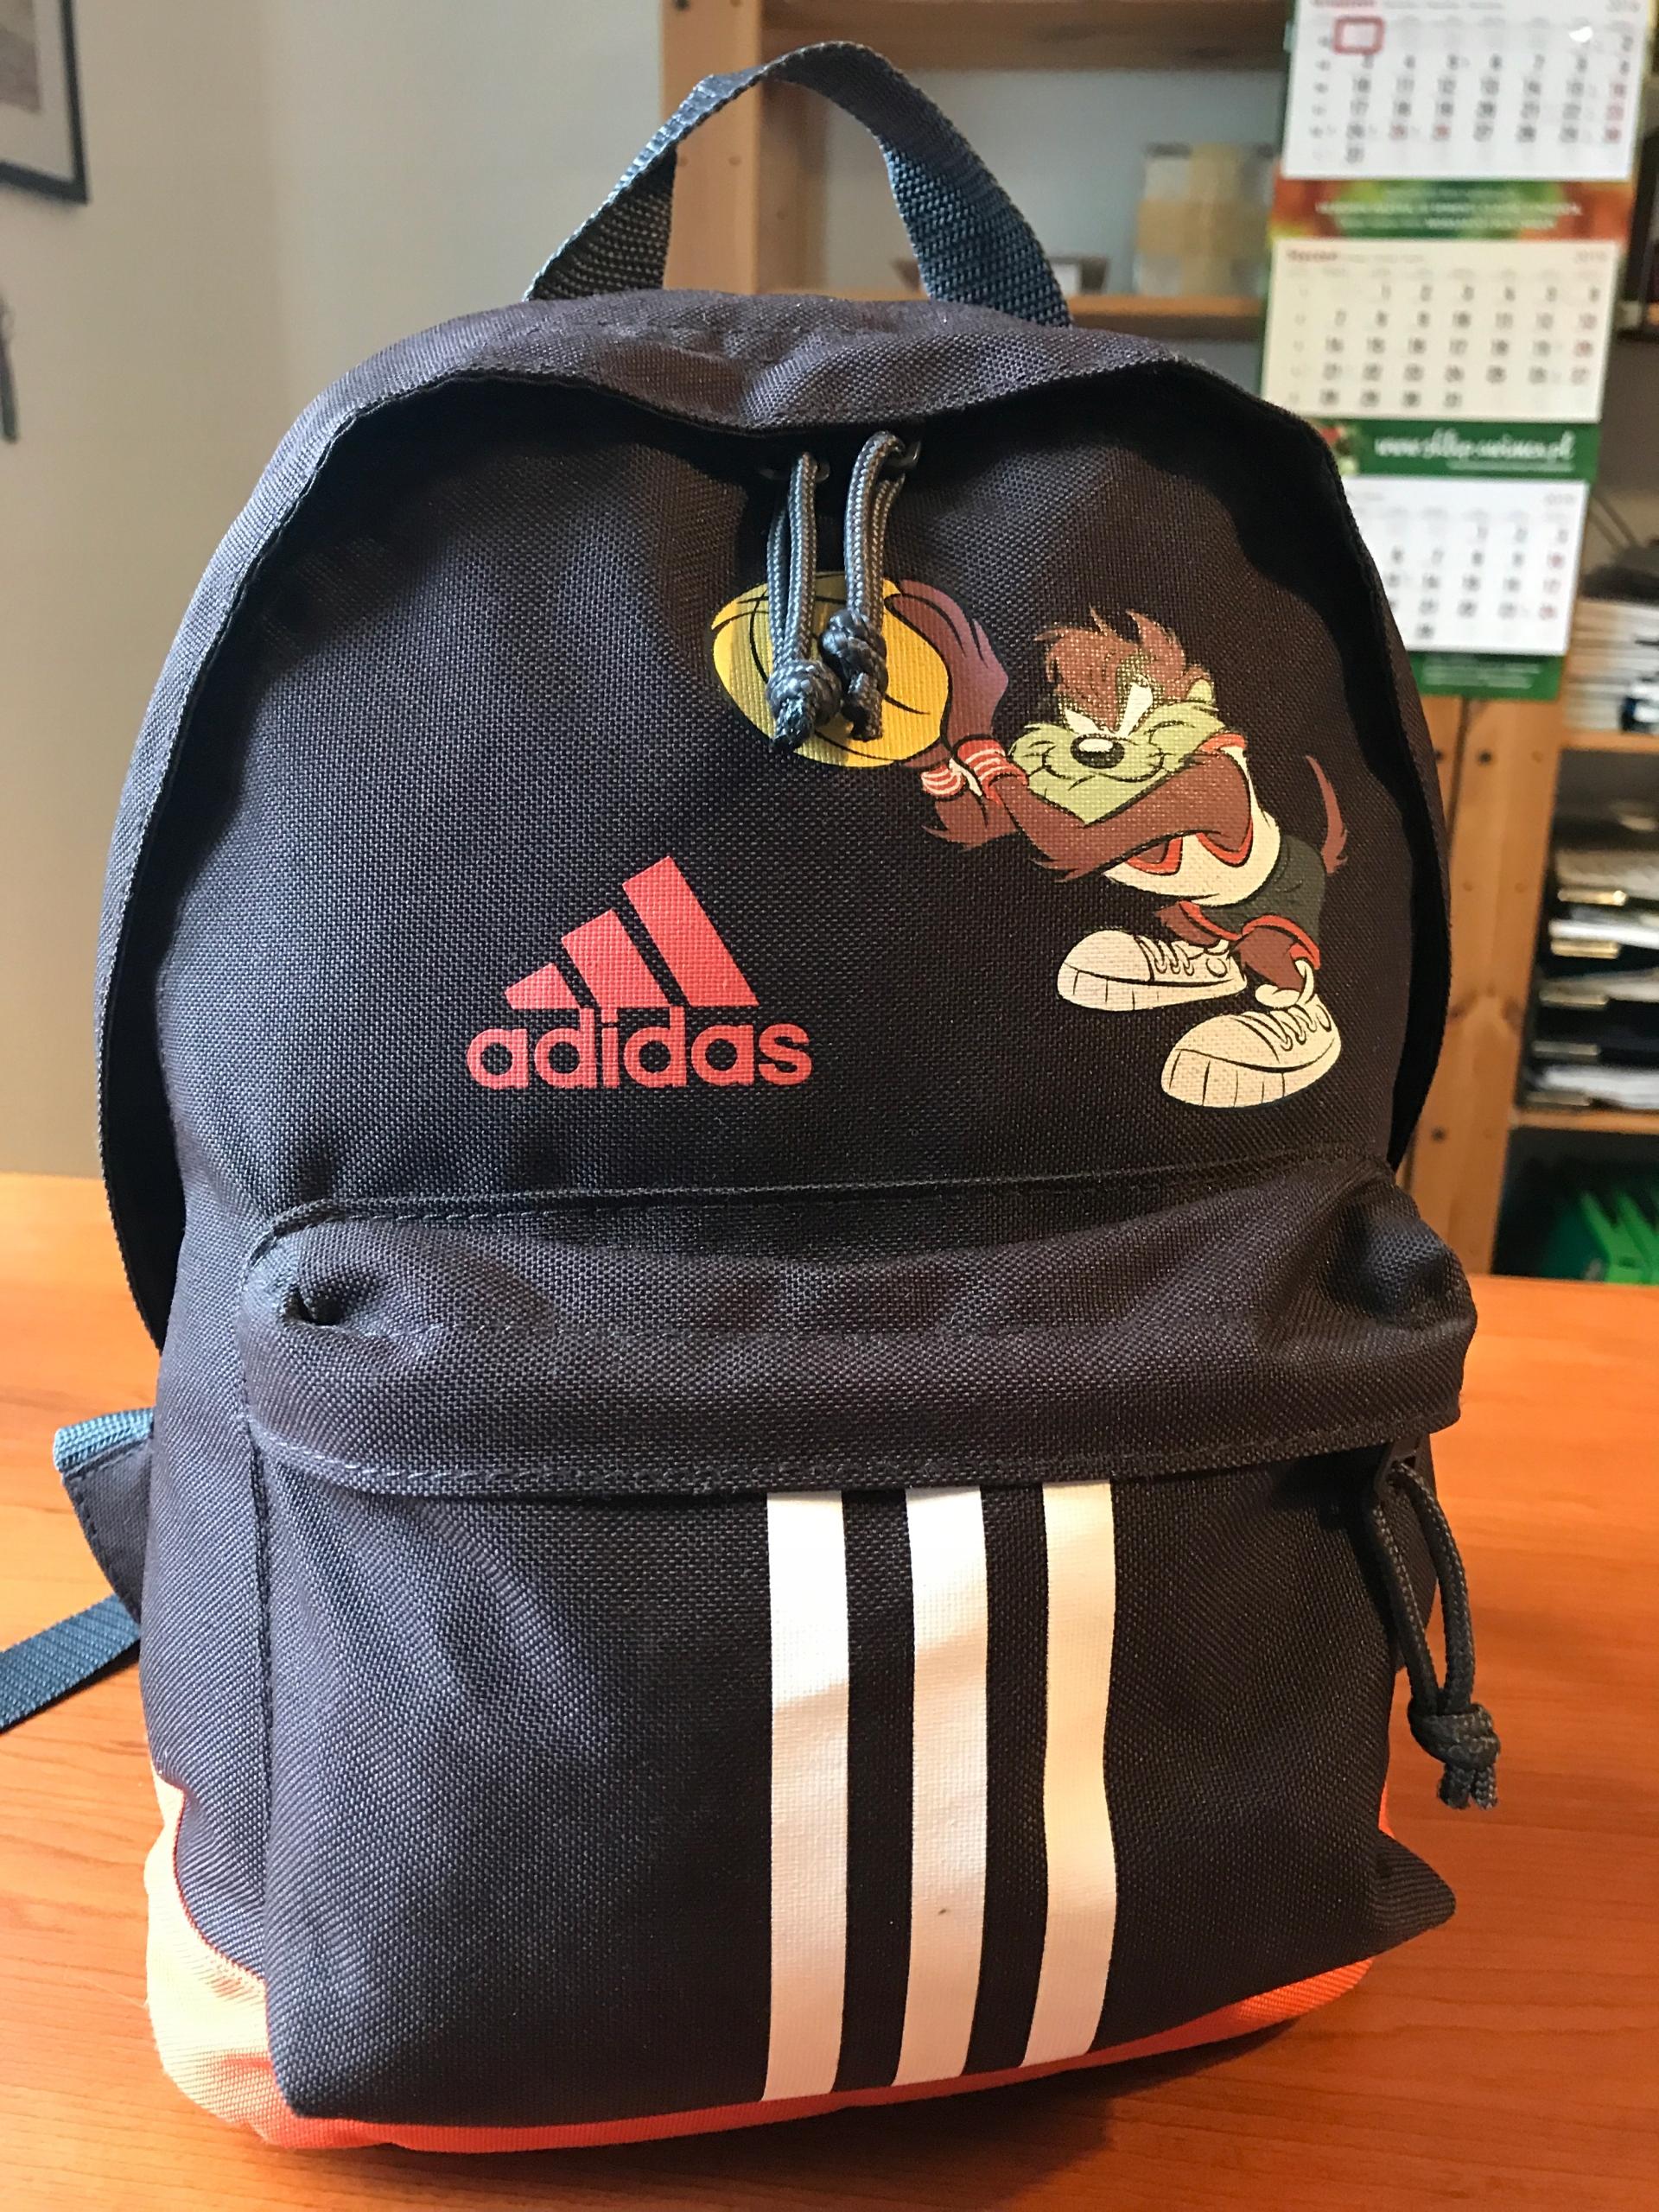 Plecak Adidas Looney Tunes. Stan idealny.